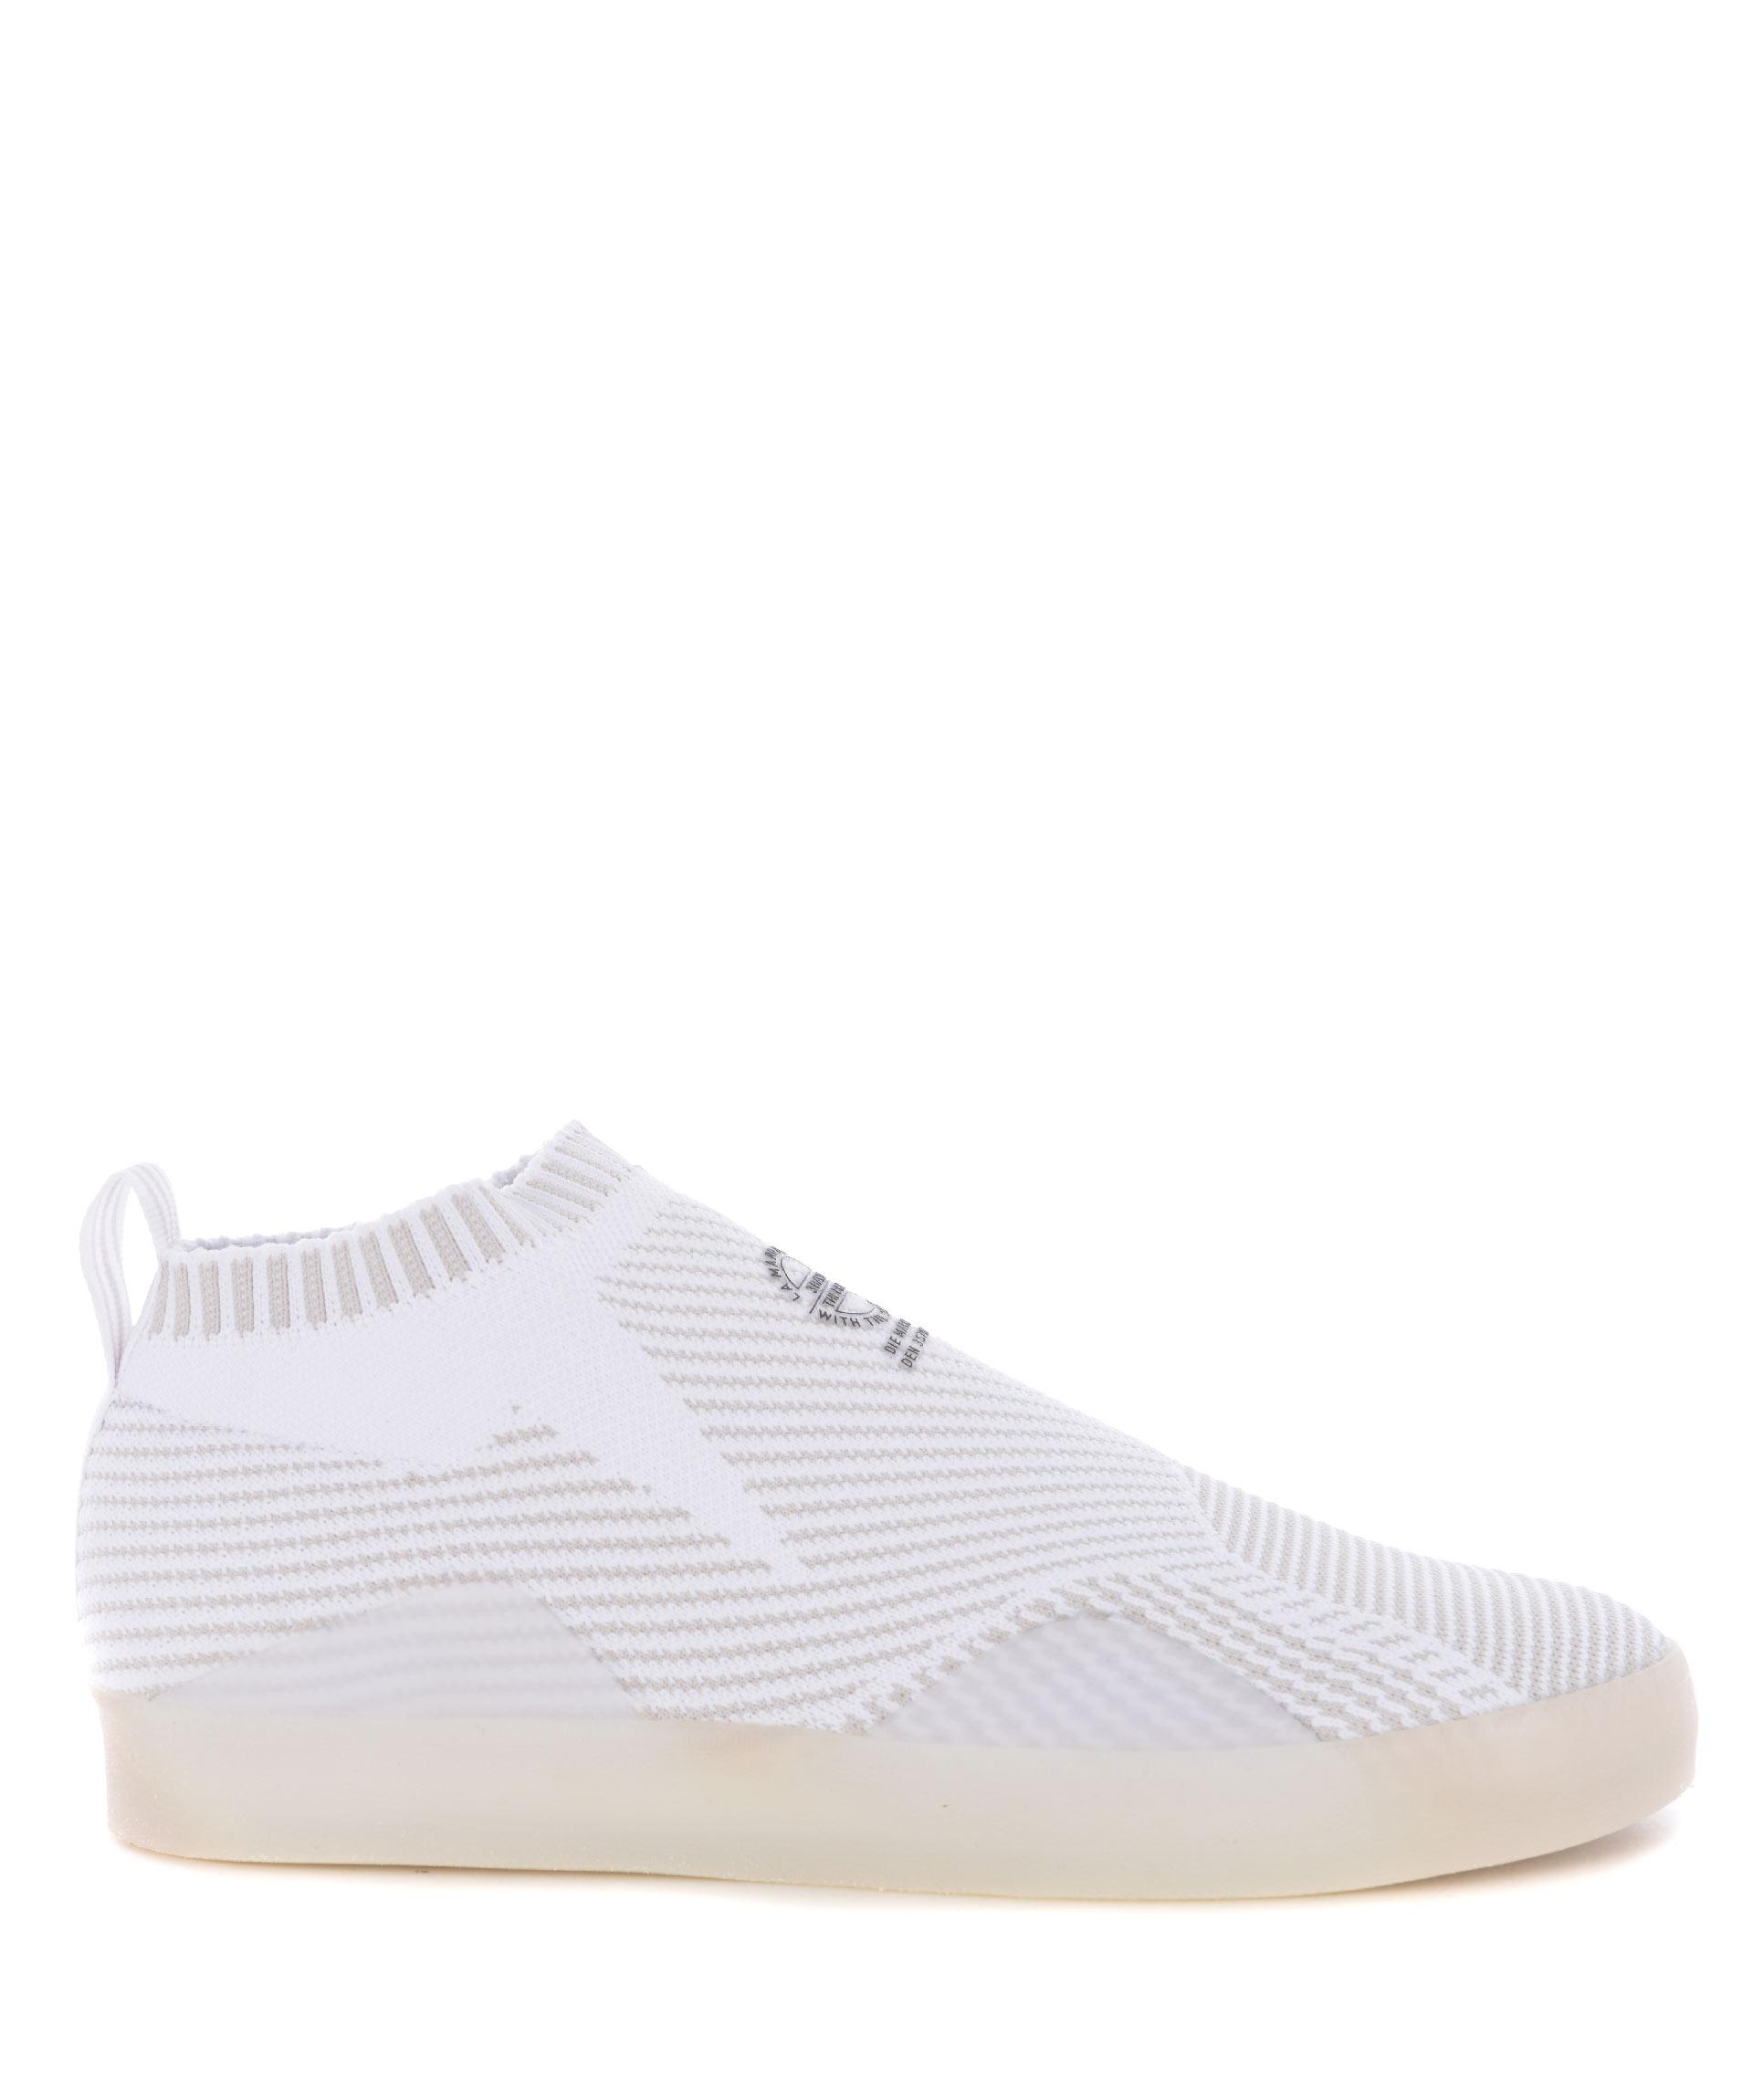 new style 6a688 e2d99 Sneakers da skate uomo Adidas. Loading zoom